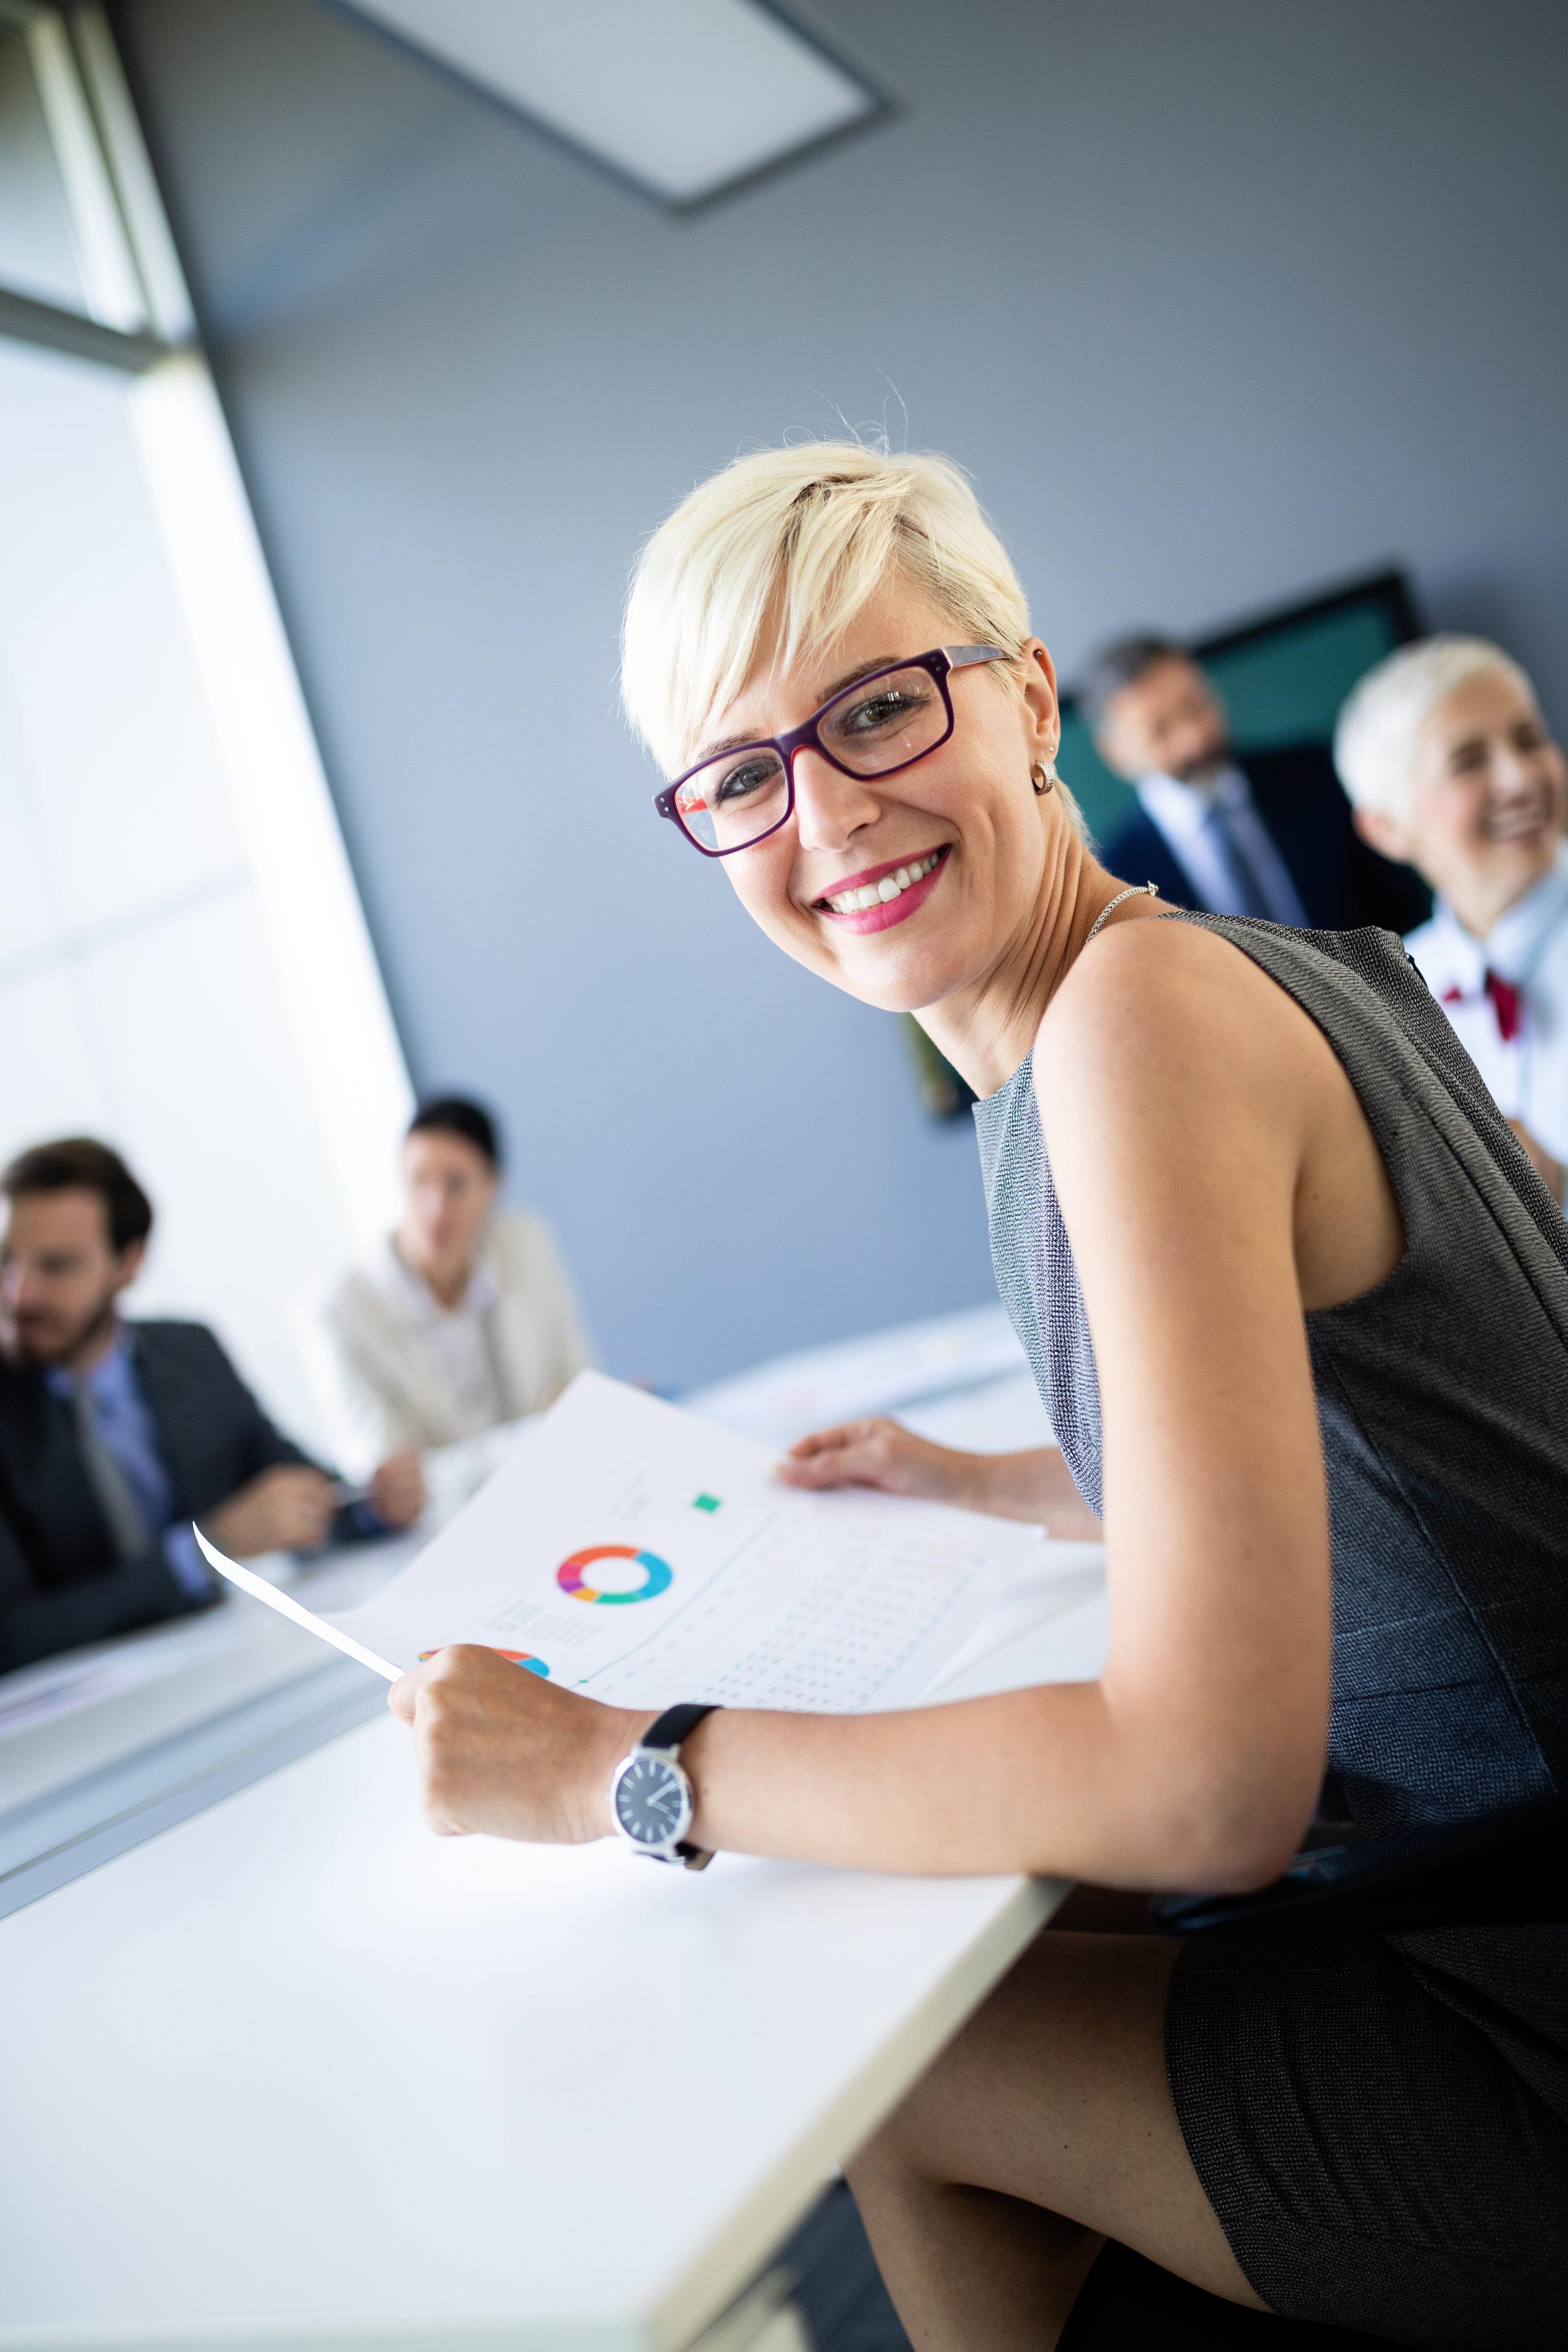 meeting-business-corporate-success-brainstorming-QAHY3UT.jpg